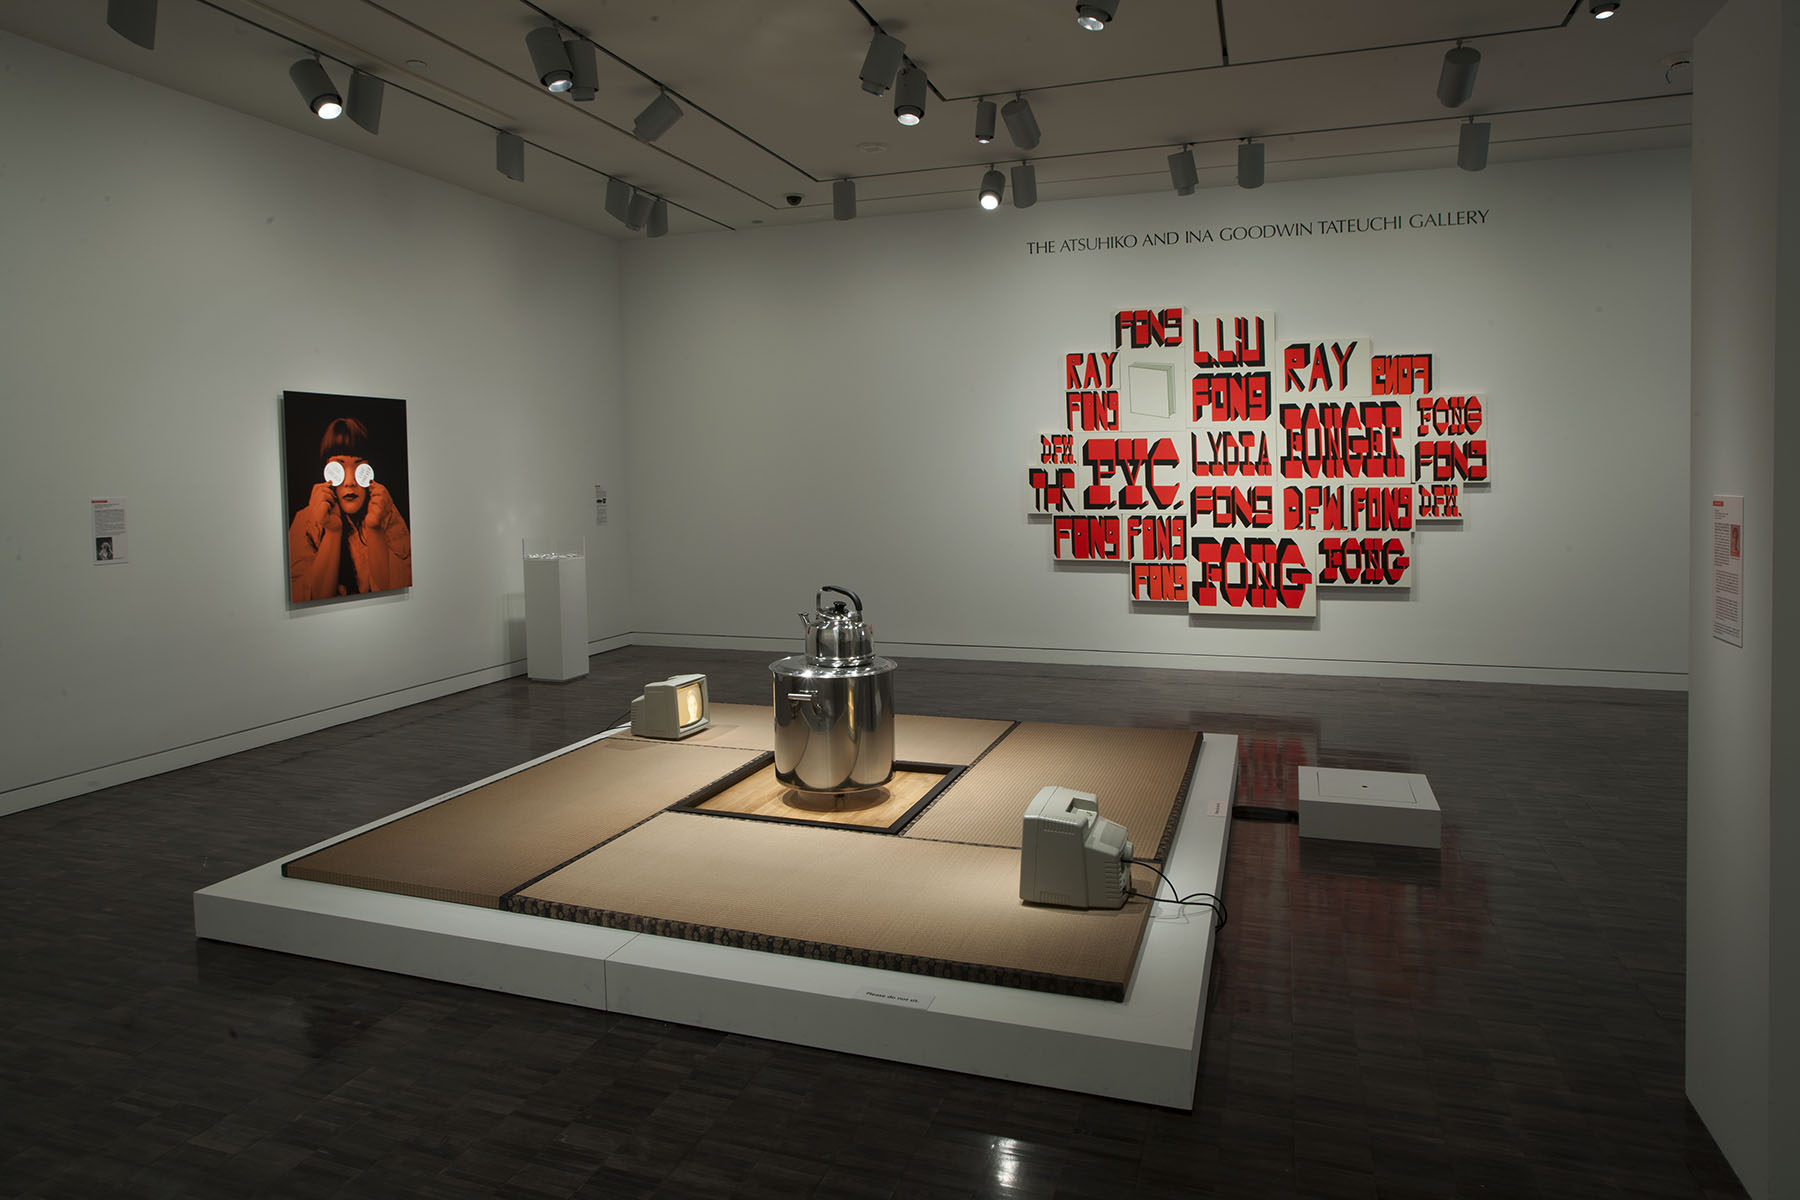 Asian arts gallery